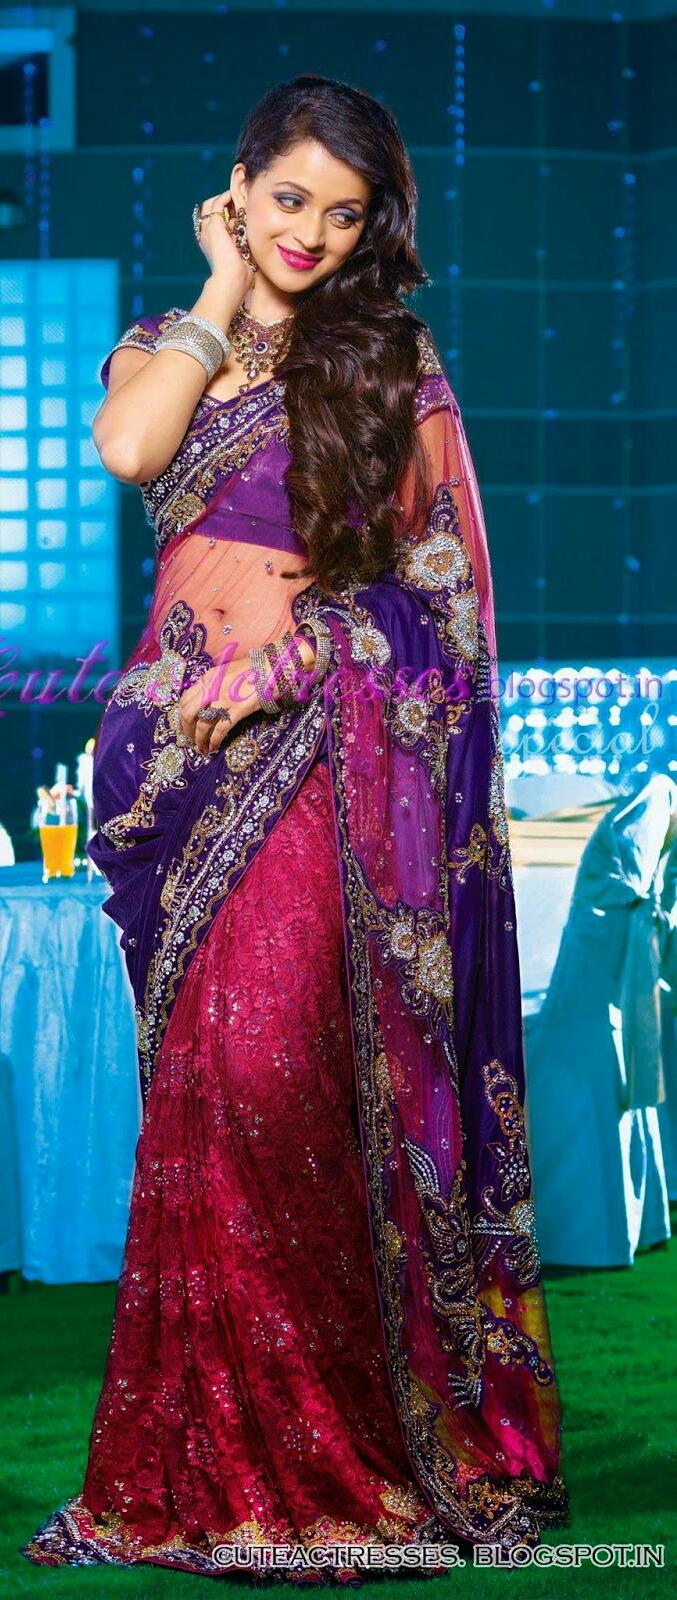 Bhavana hottest saree pictures